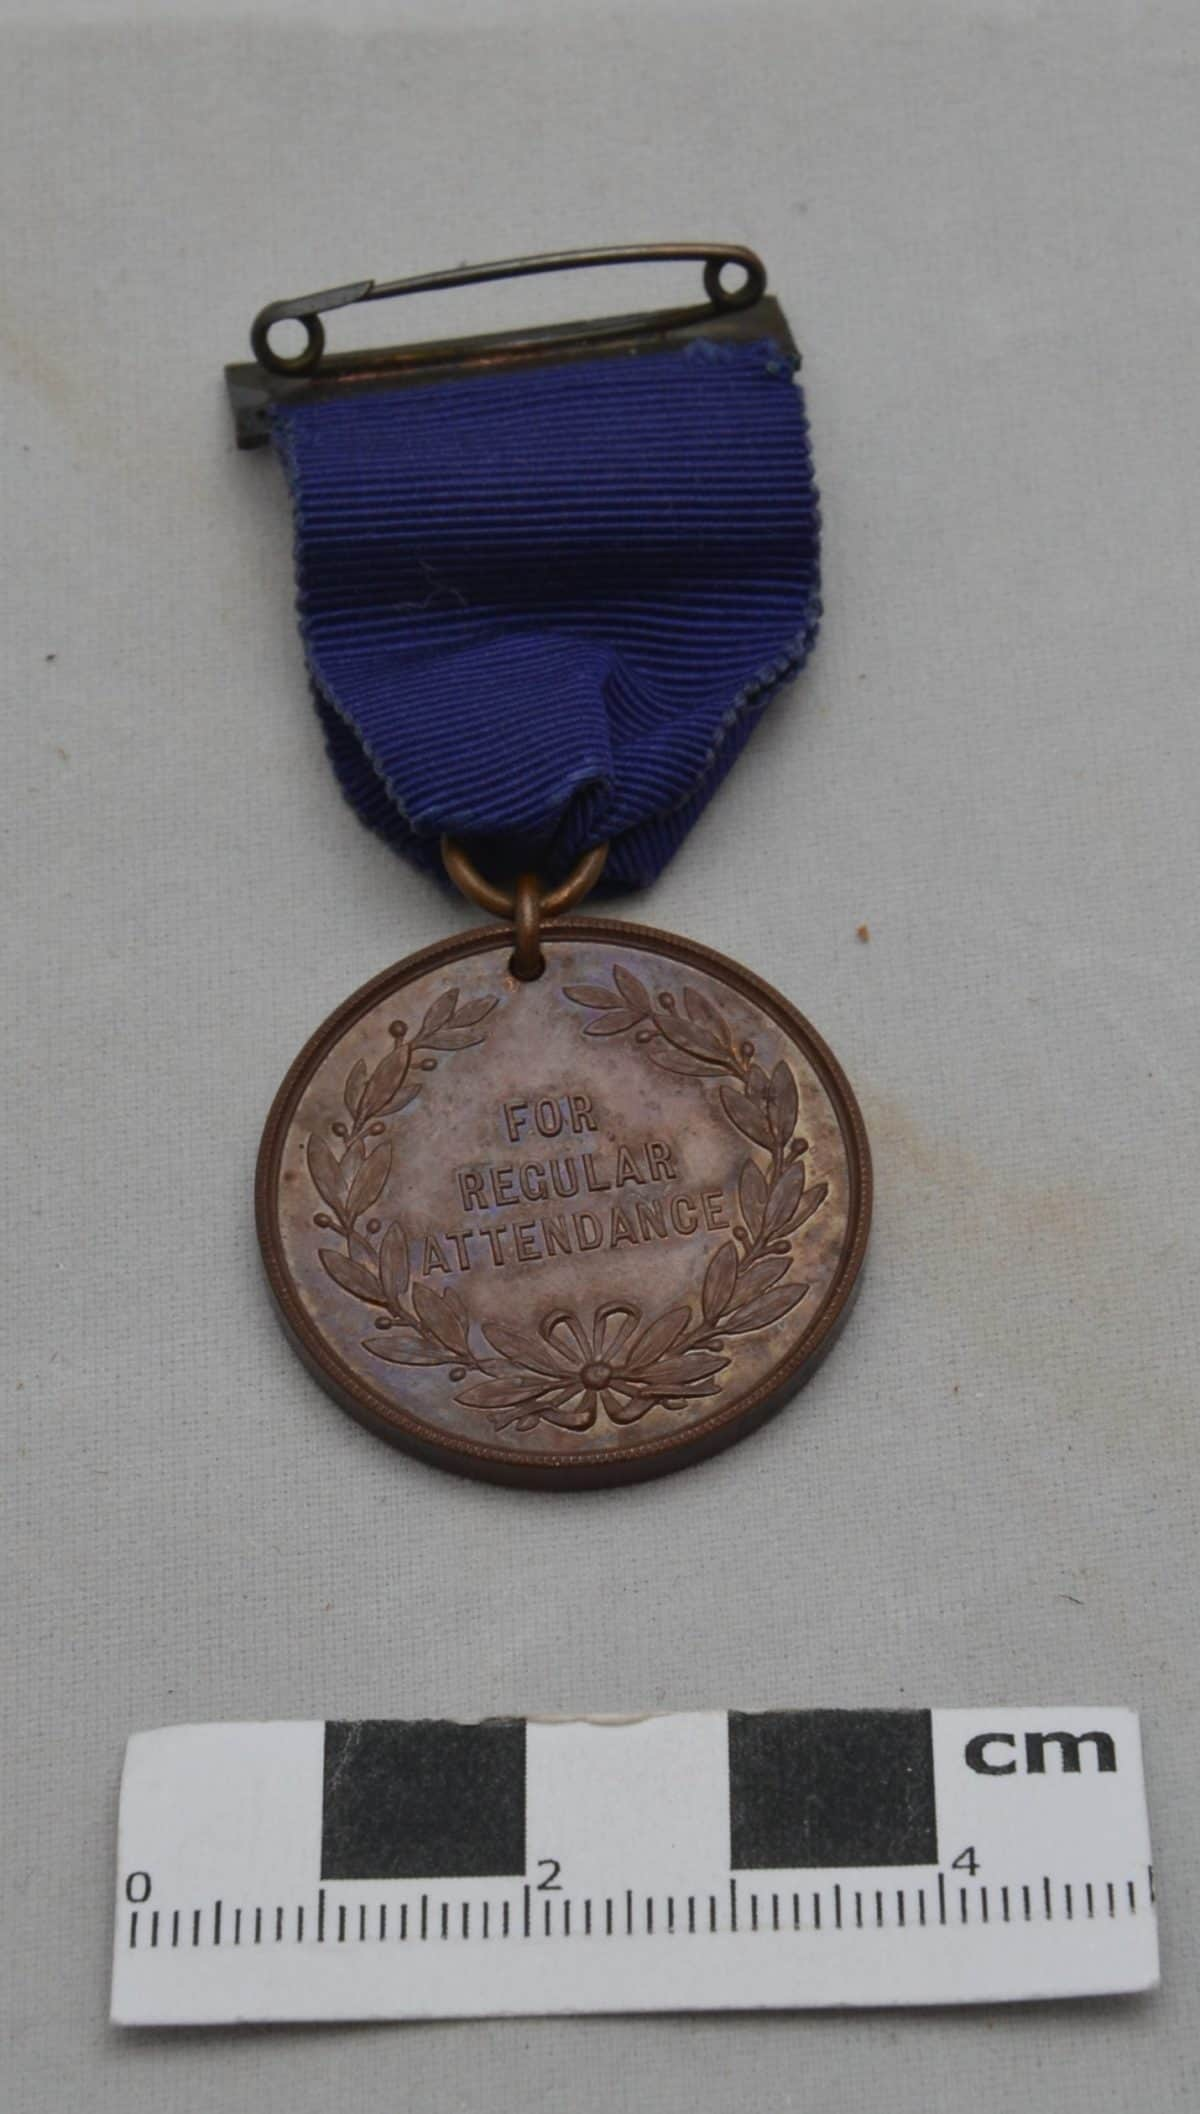 WW2 6 F2639 School Medal For Regular Attendance . Folkestone Borough